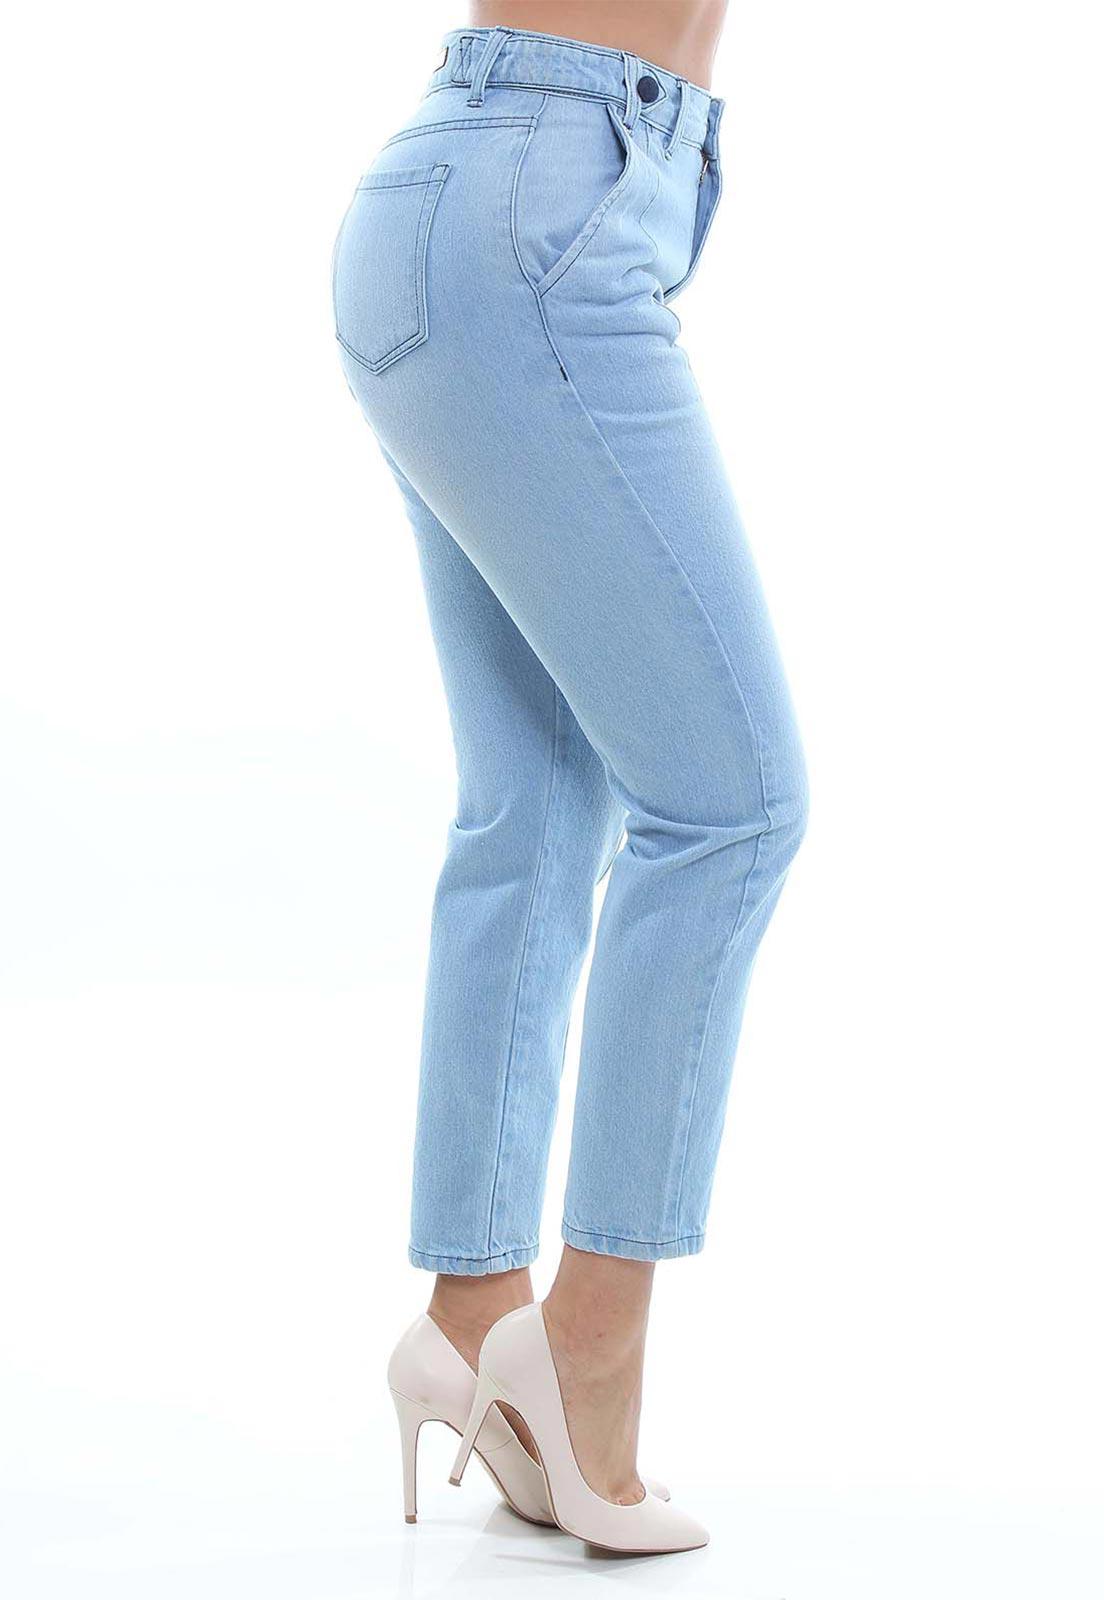 Calça Mom Fit Jeans Feminina Crocker - 48048  - CROCKER JEANS